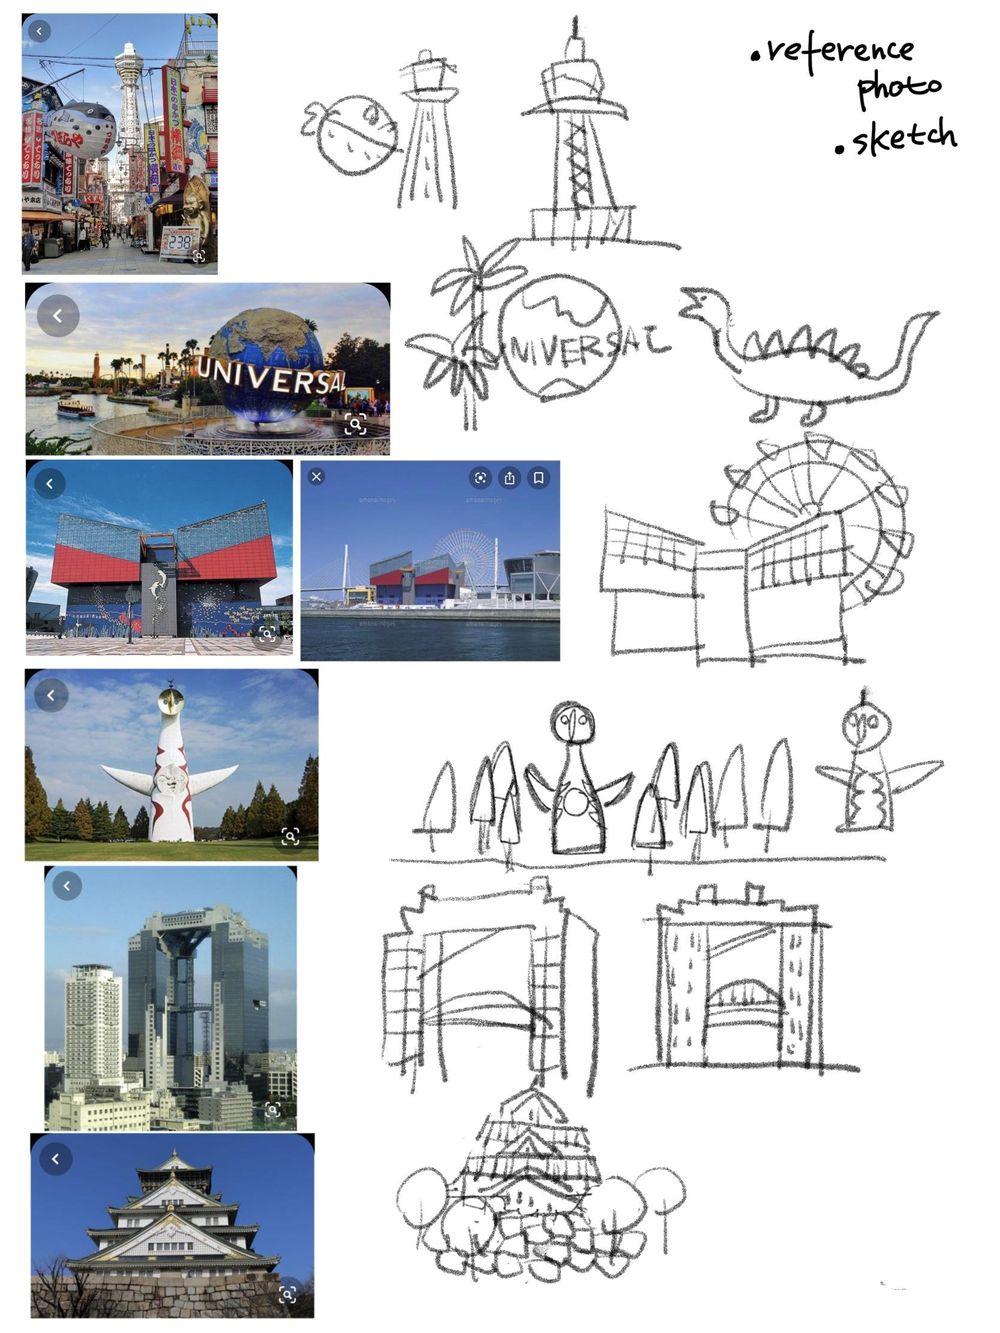 Osaka - image 2 - student project